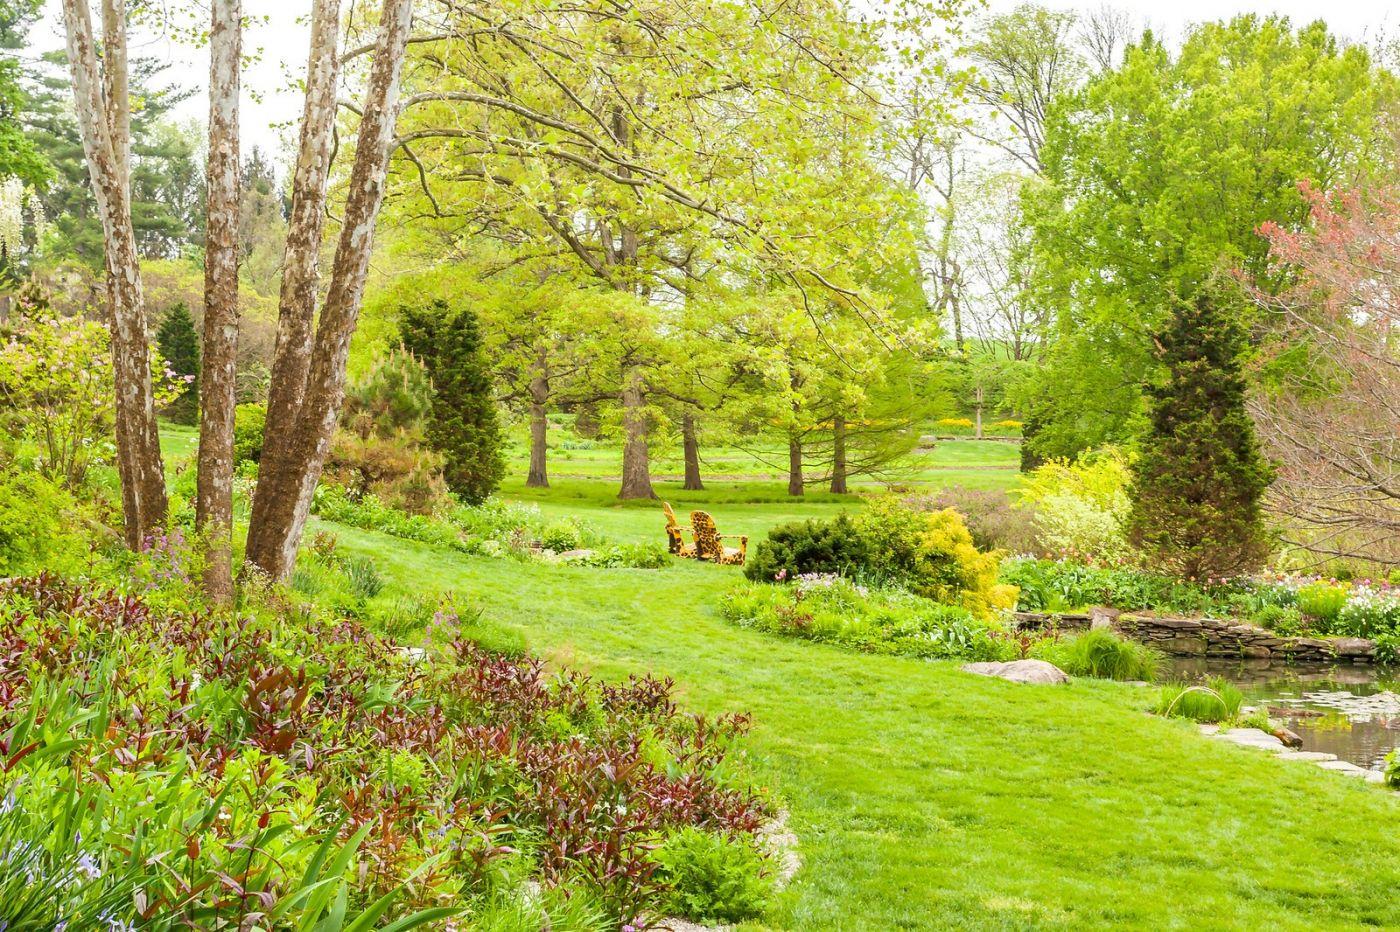 Chanticleer花园,融入自然_图1-9